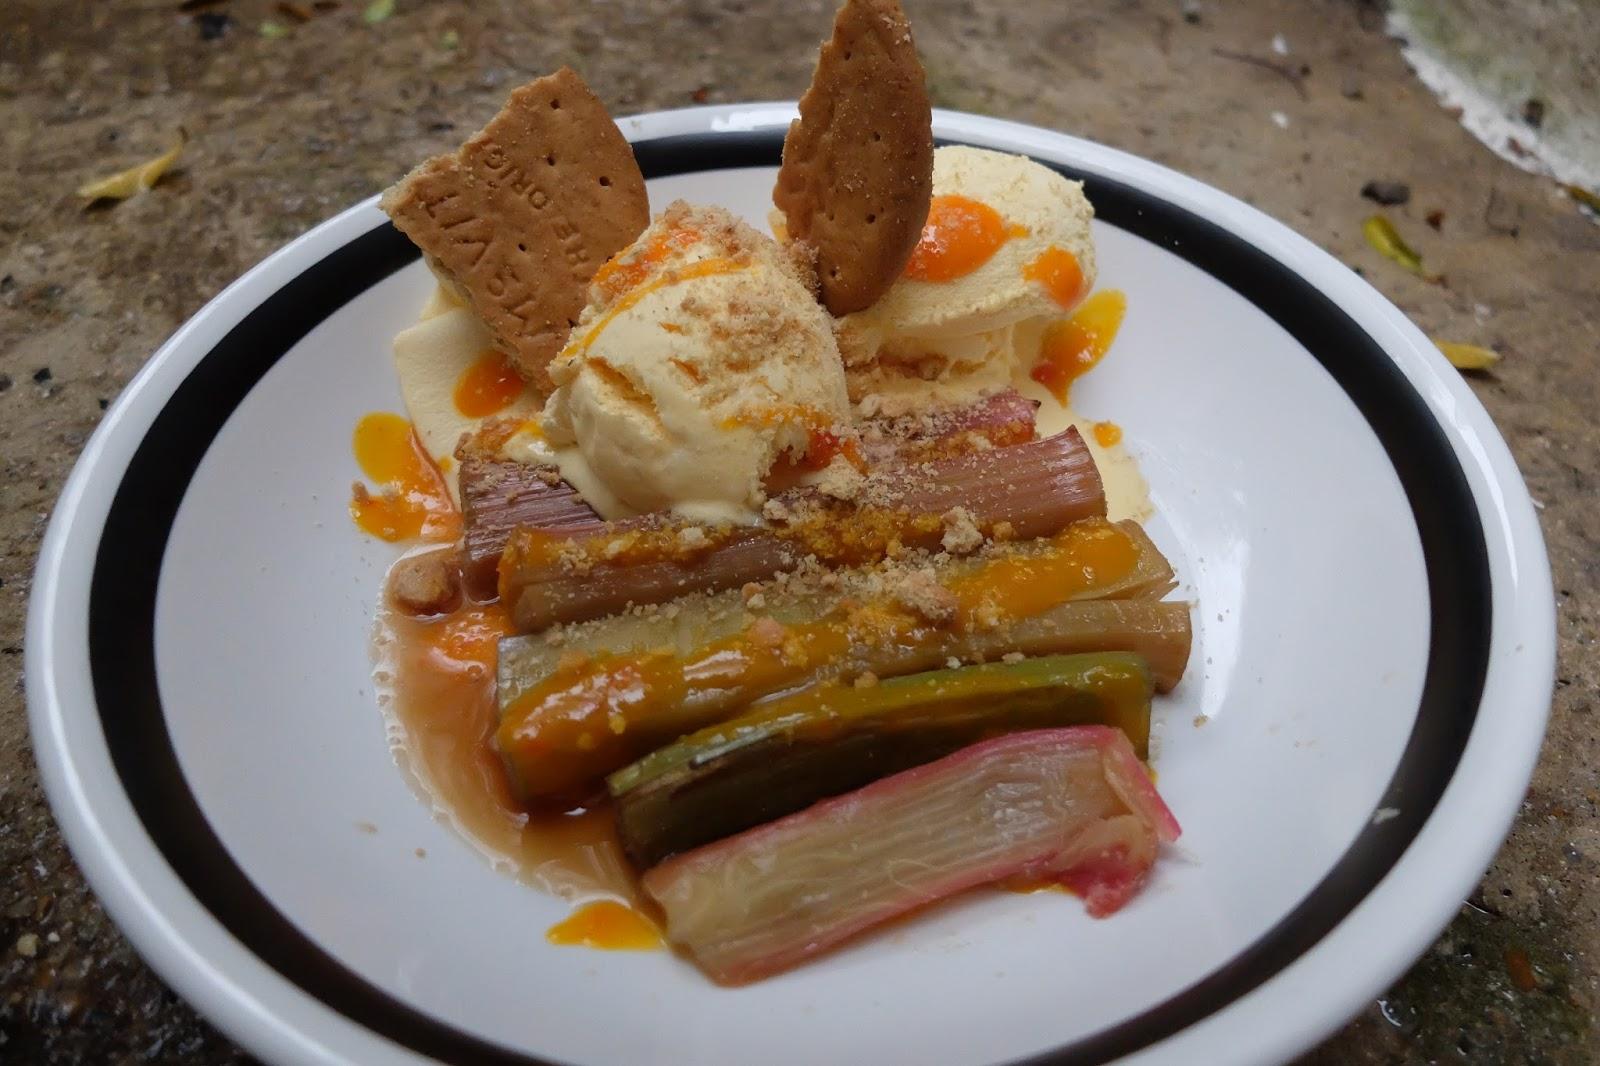 Baked Rhubarb, Ice Cream and Mango Chilli Sauce  recipe